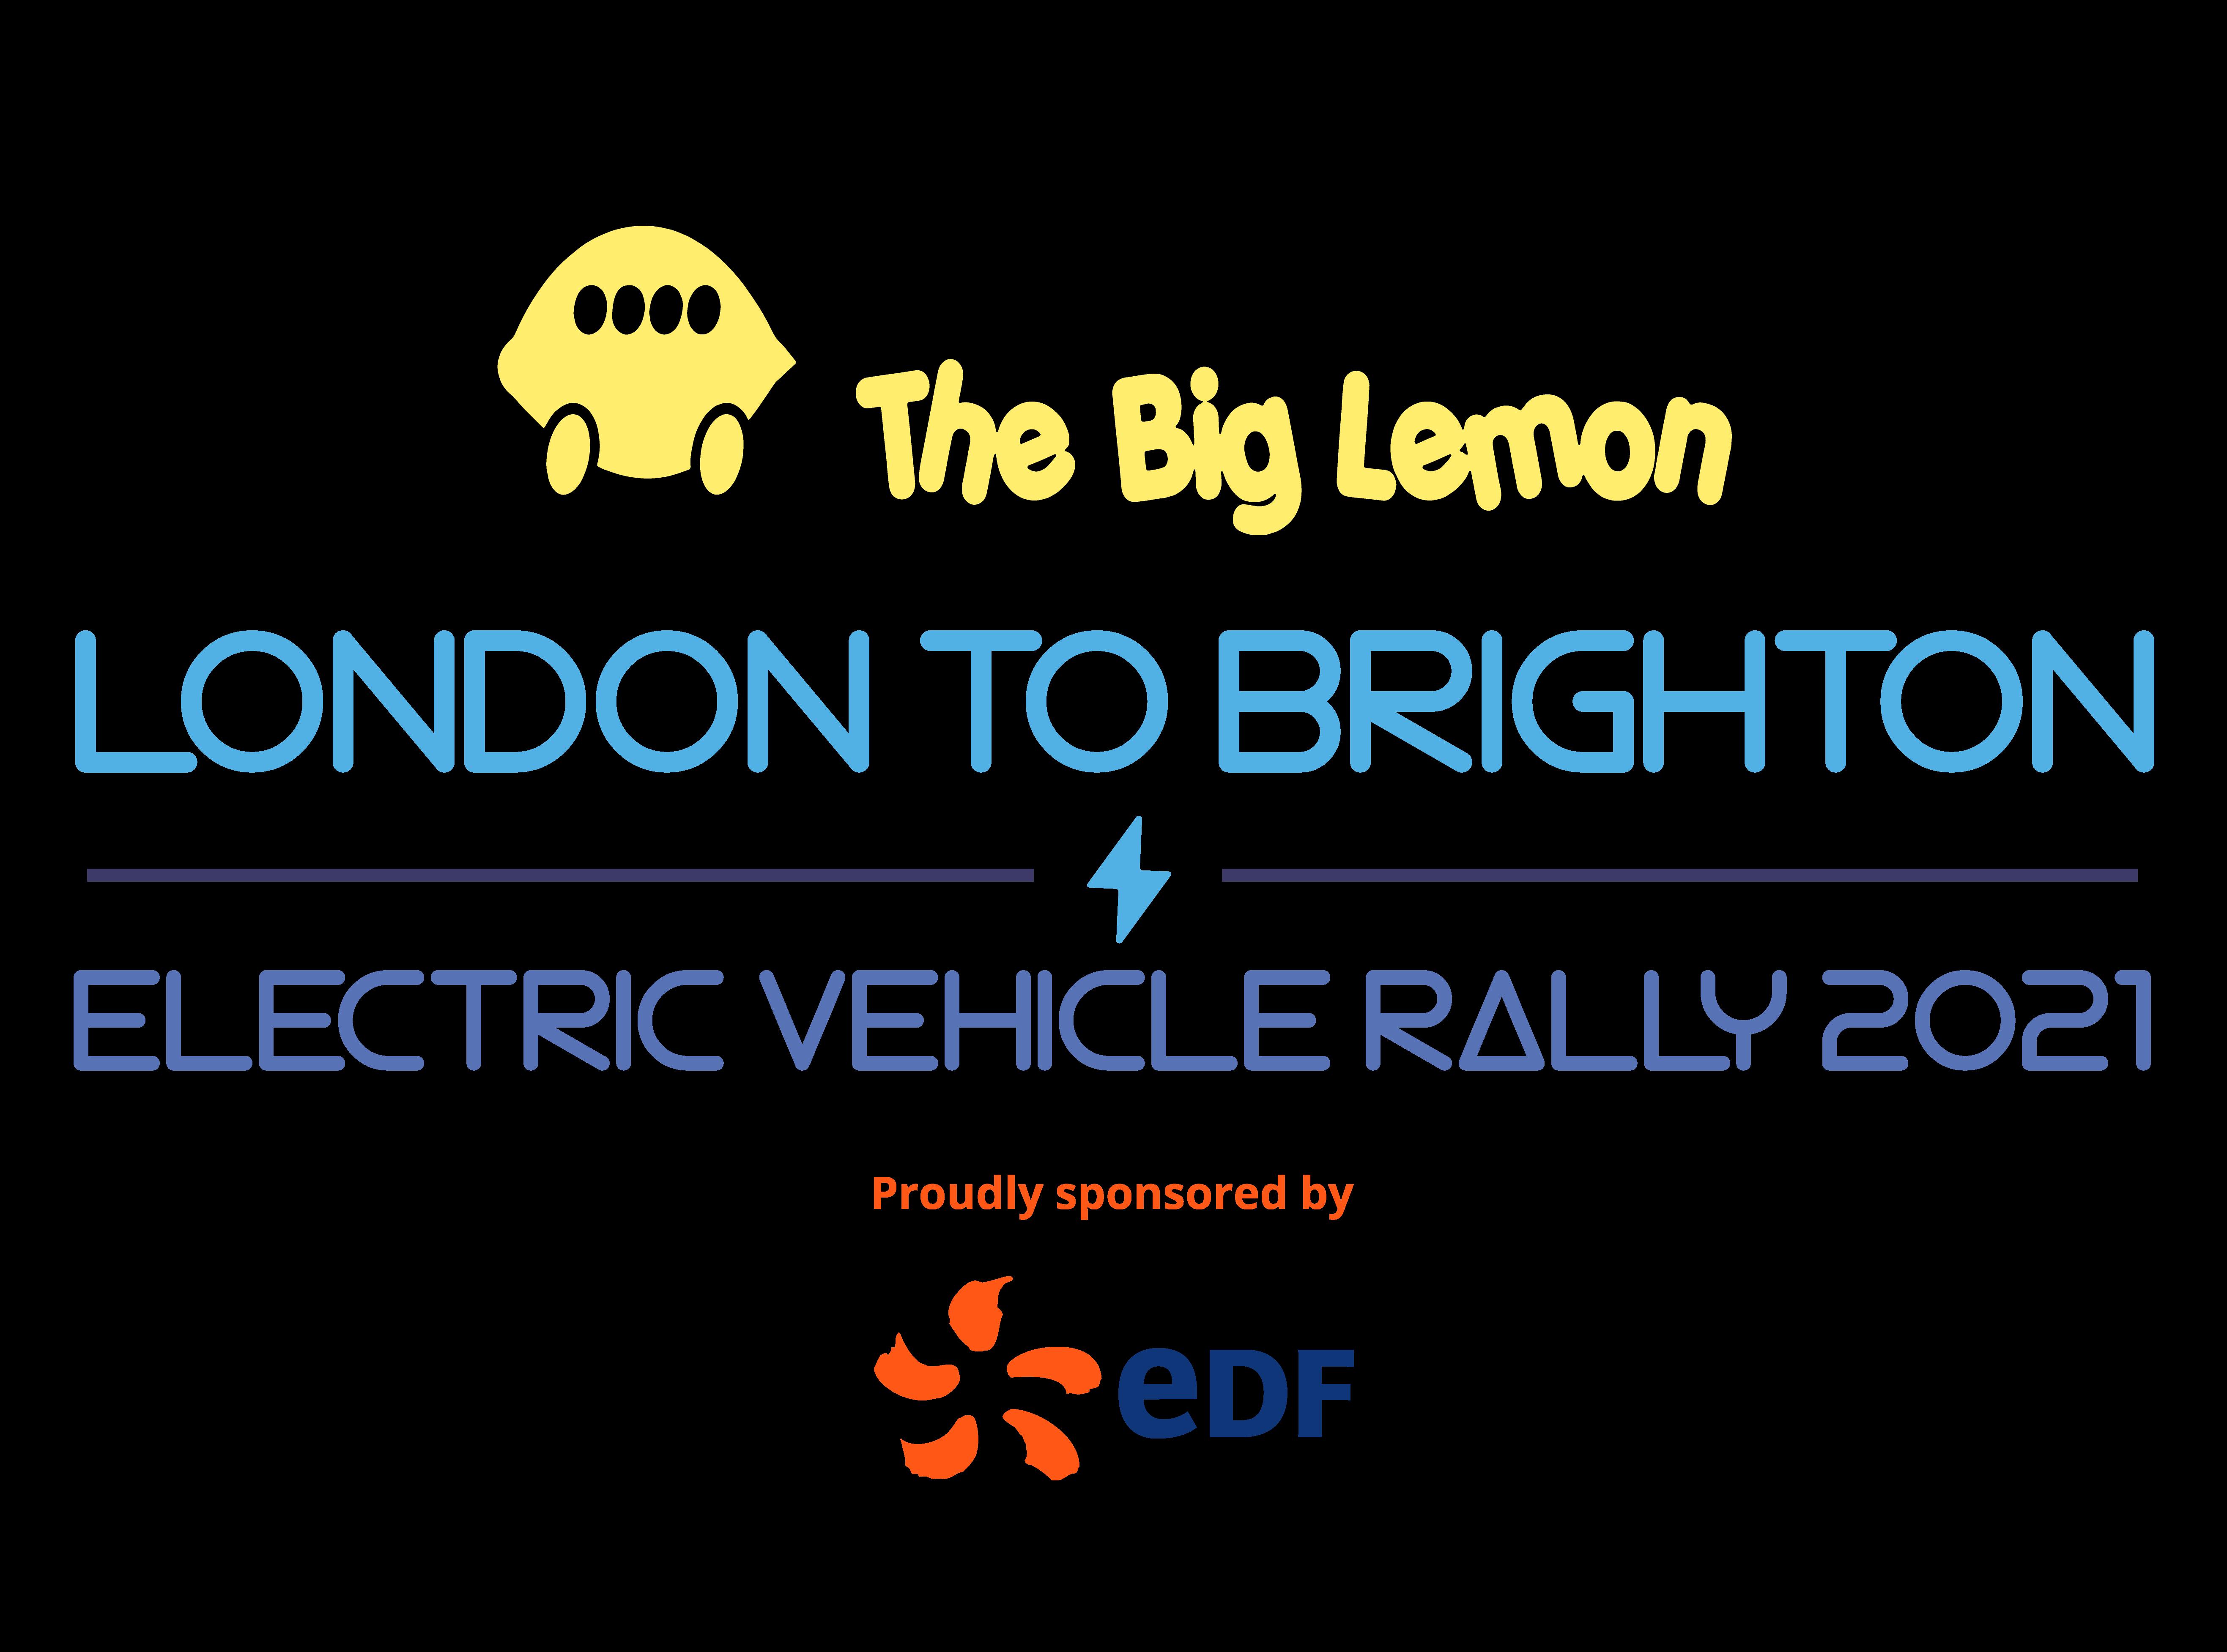 London to Brighton EV Rally logo 2021